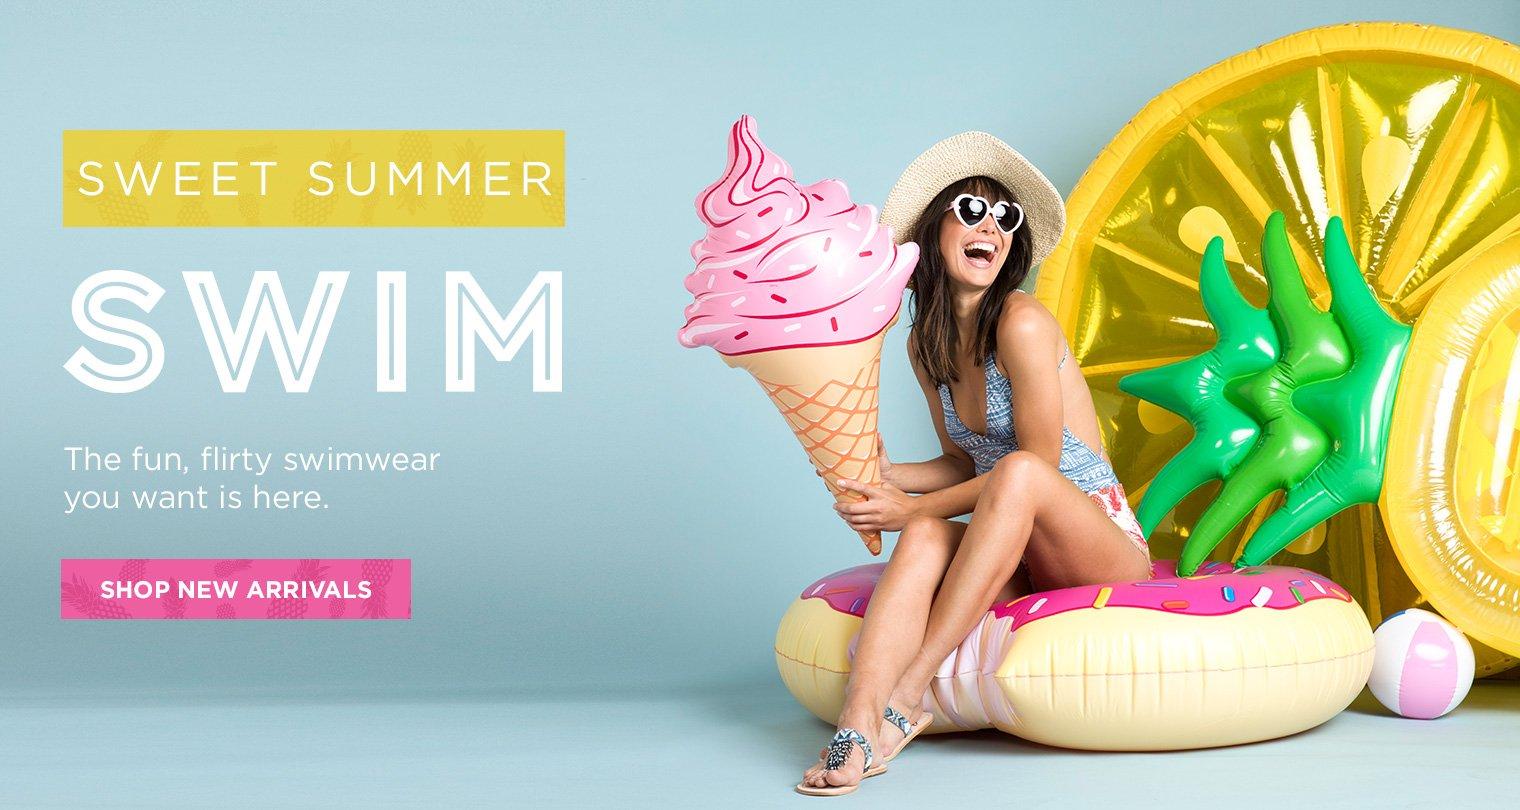 Sweet Summer Swim. The fun, flirty swimwear you want is here. Shop New Arrivals.